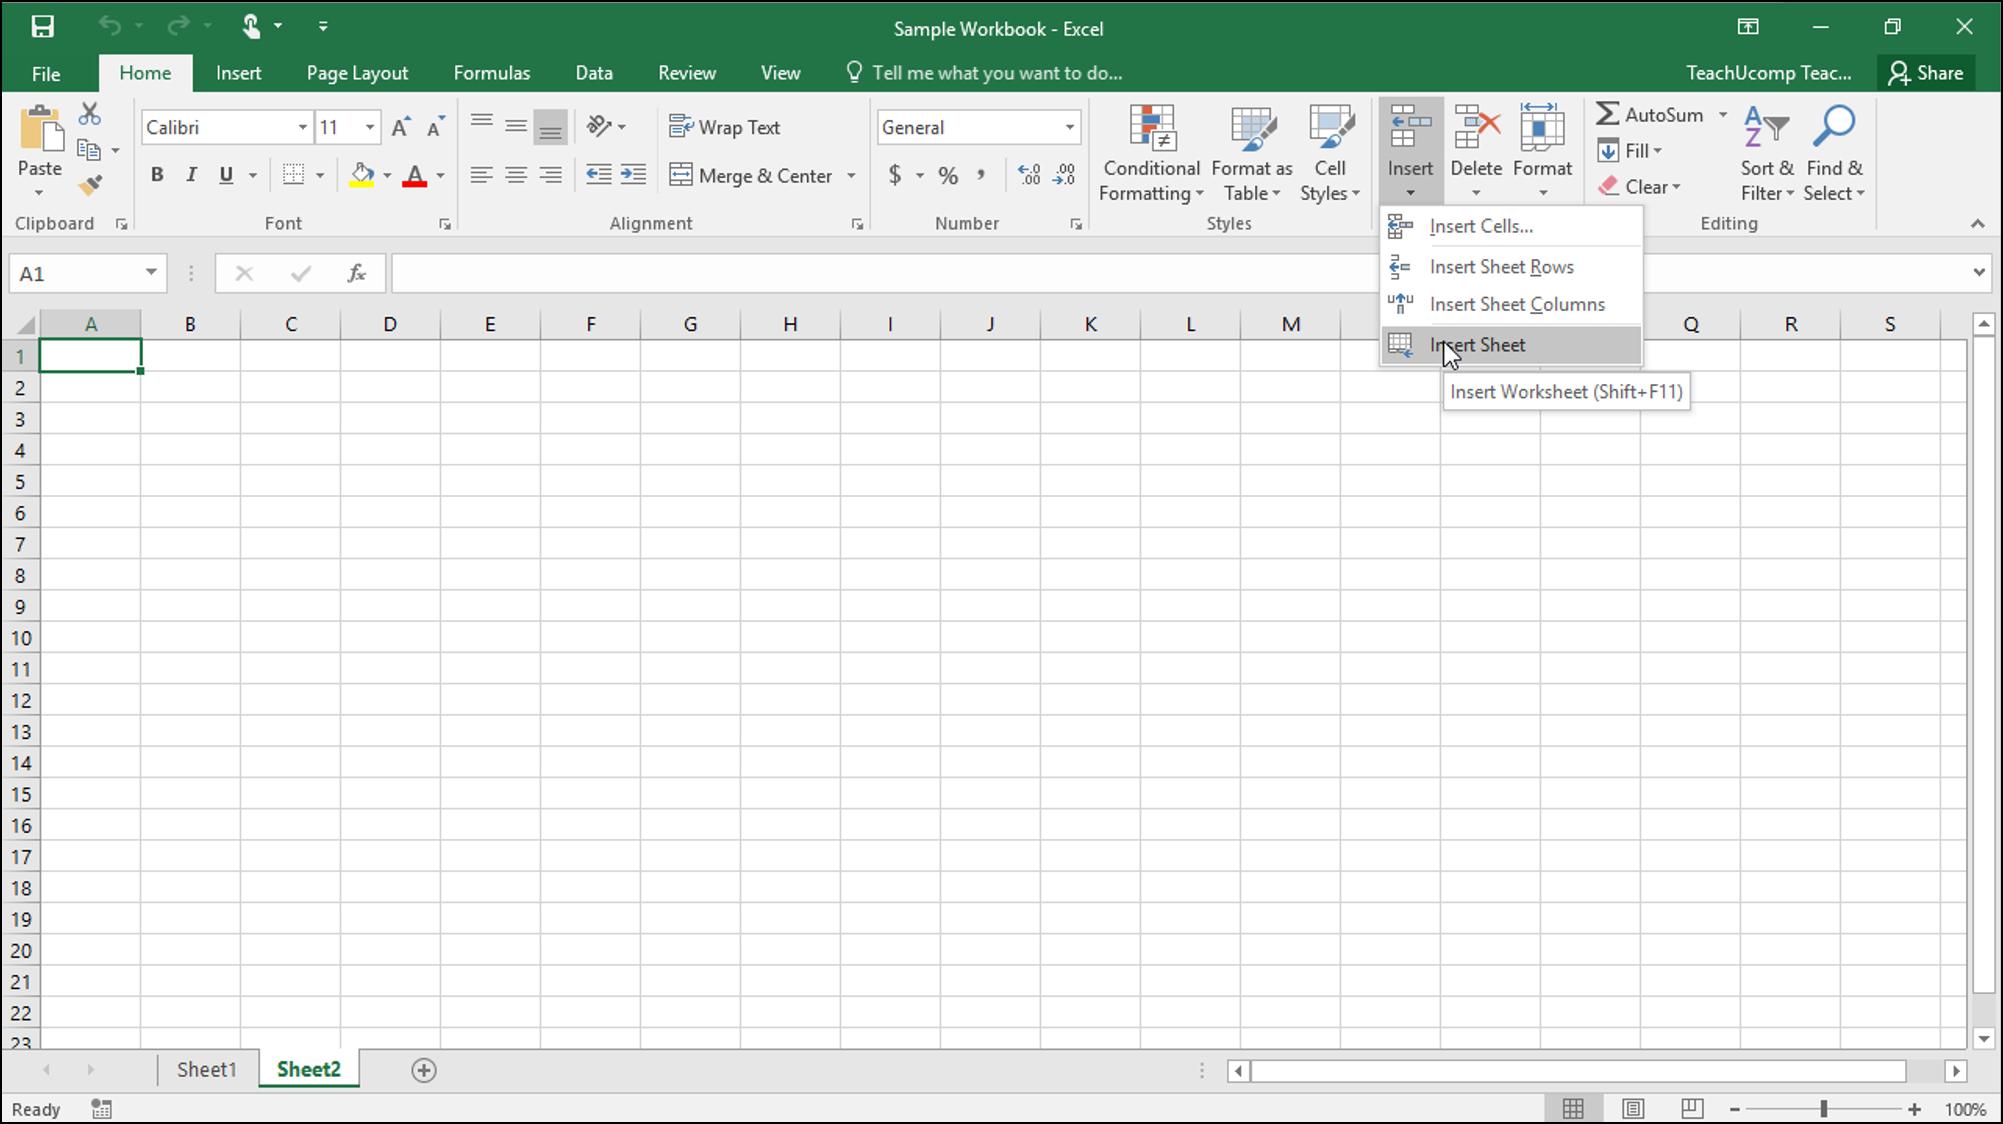 Download Add Worksheet In Excel Intended For Add Worksheet In Excel Format